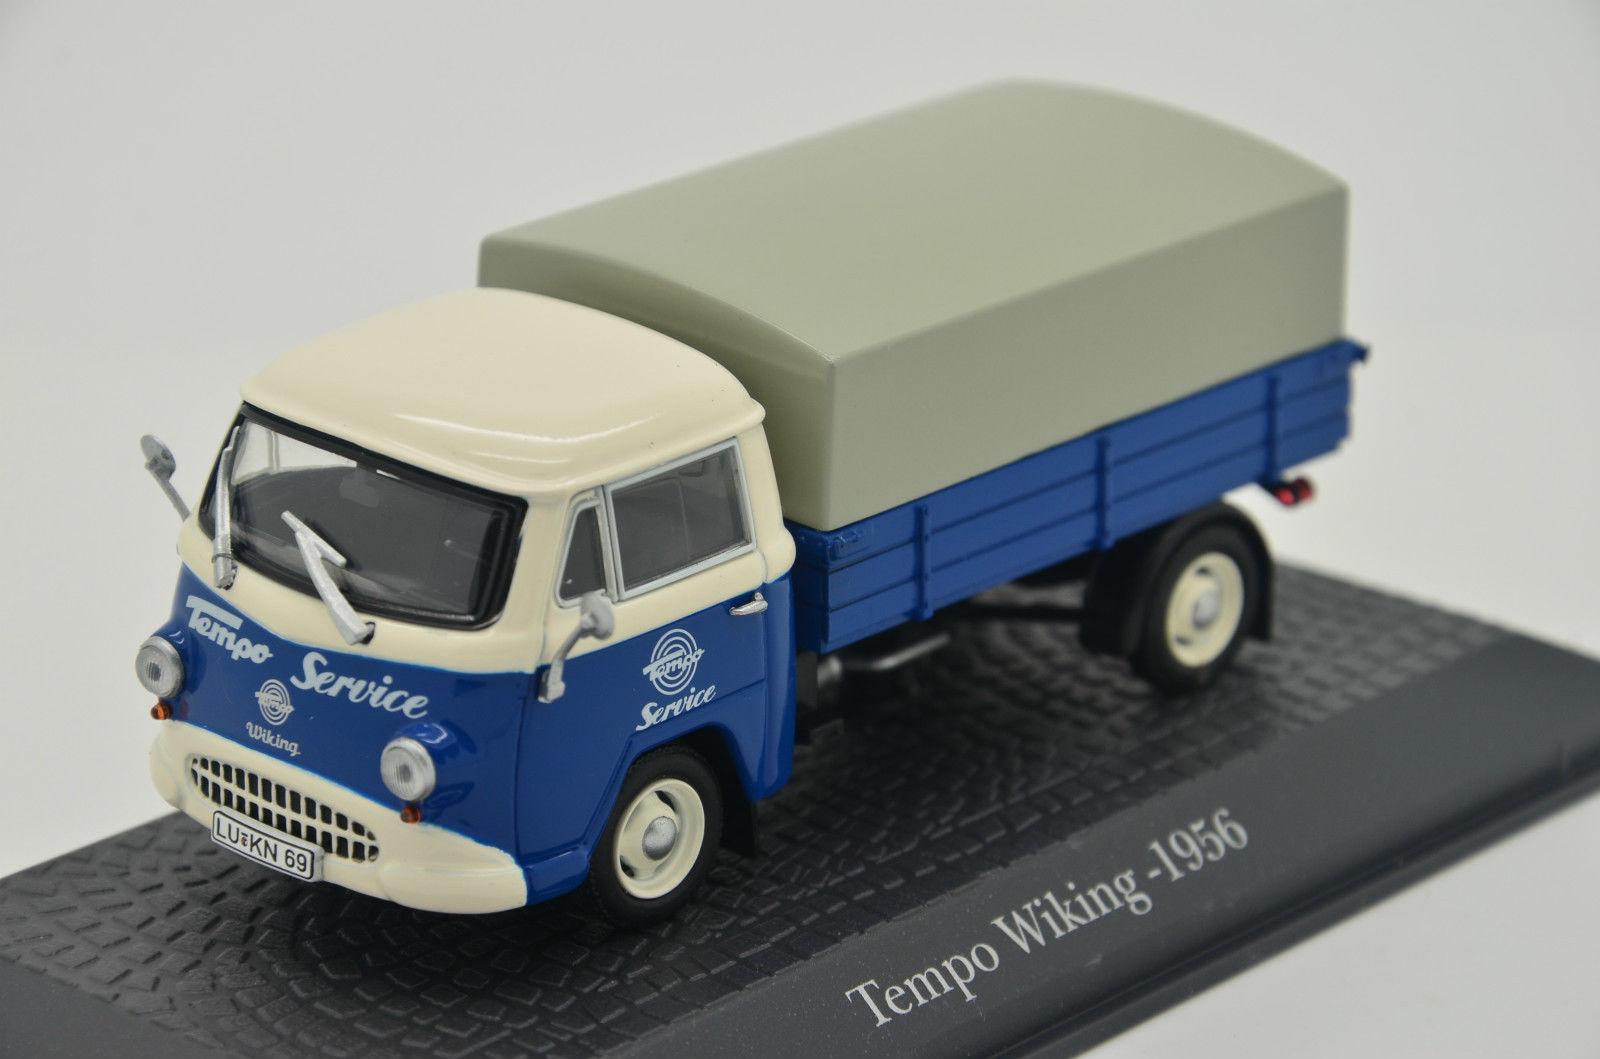 43_Tempo_Wiking_1956_a